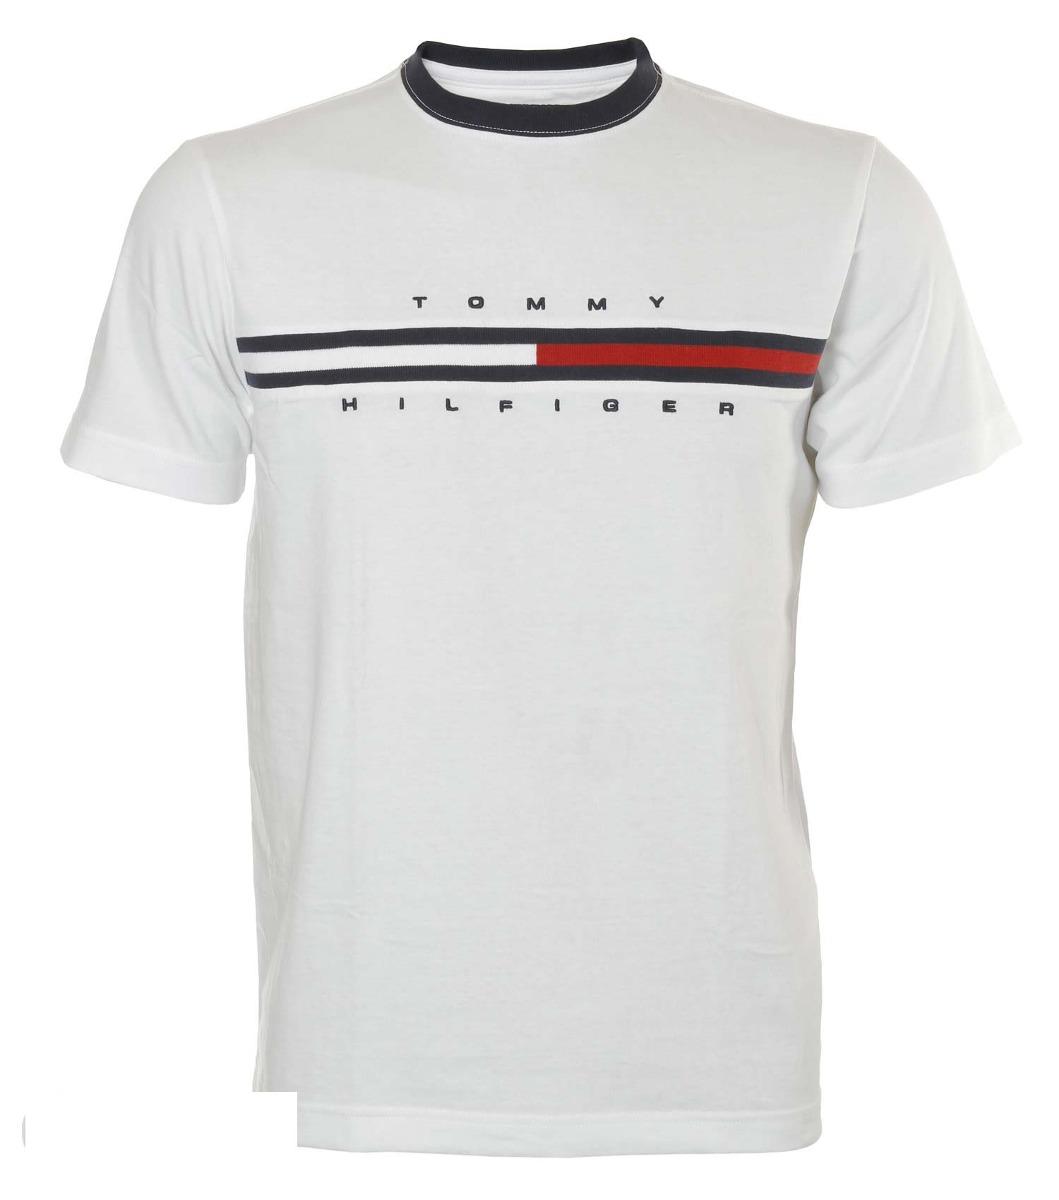 5b02a6fe0707e camiseta masculina tommy hilfiger goya. Carregando zoom.